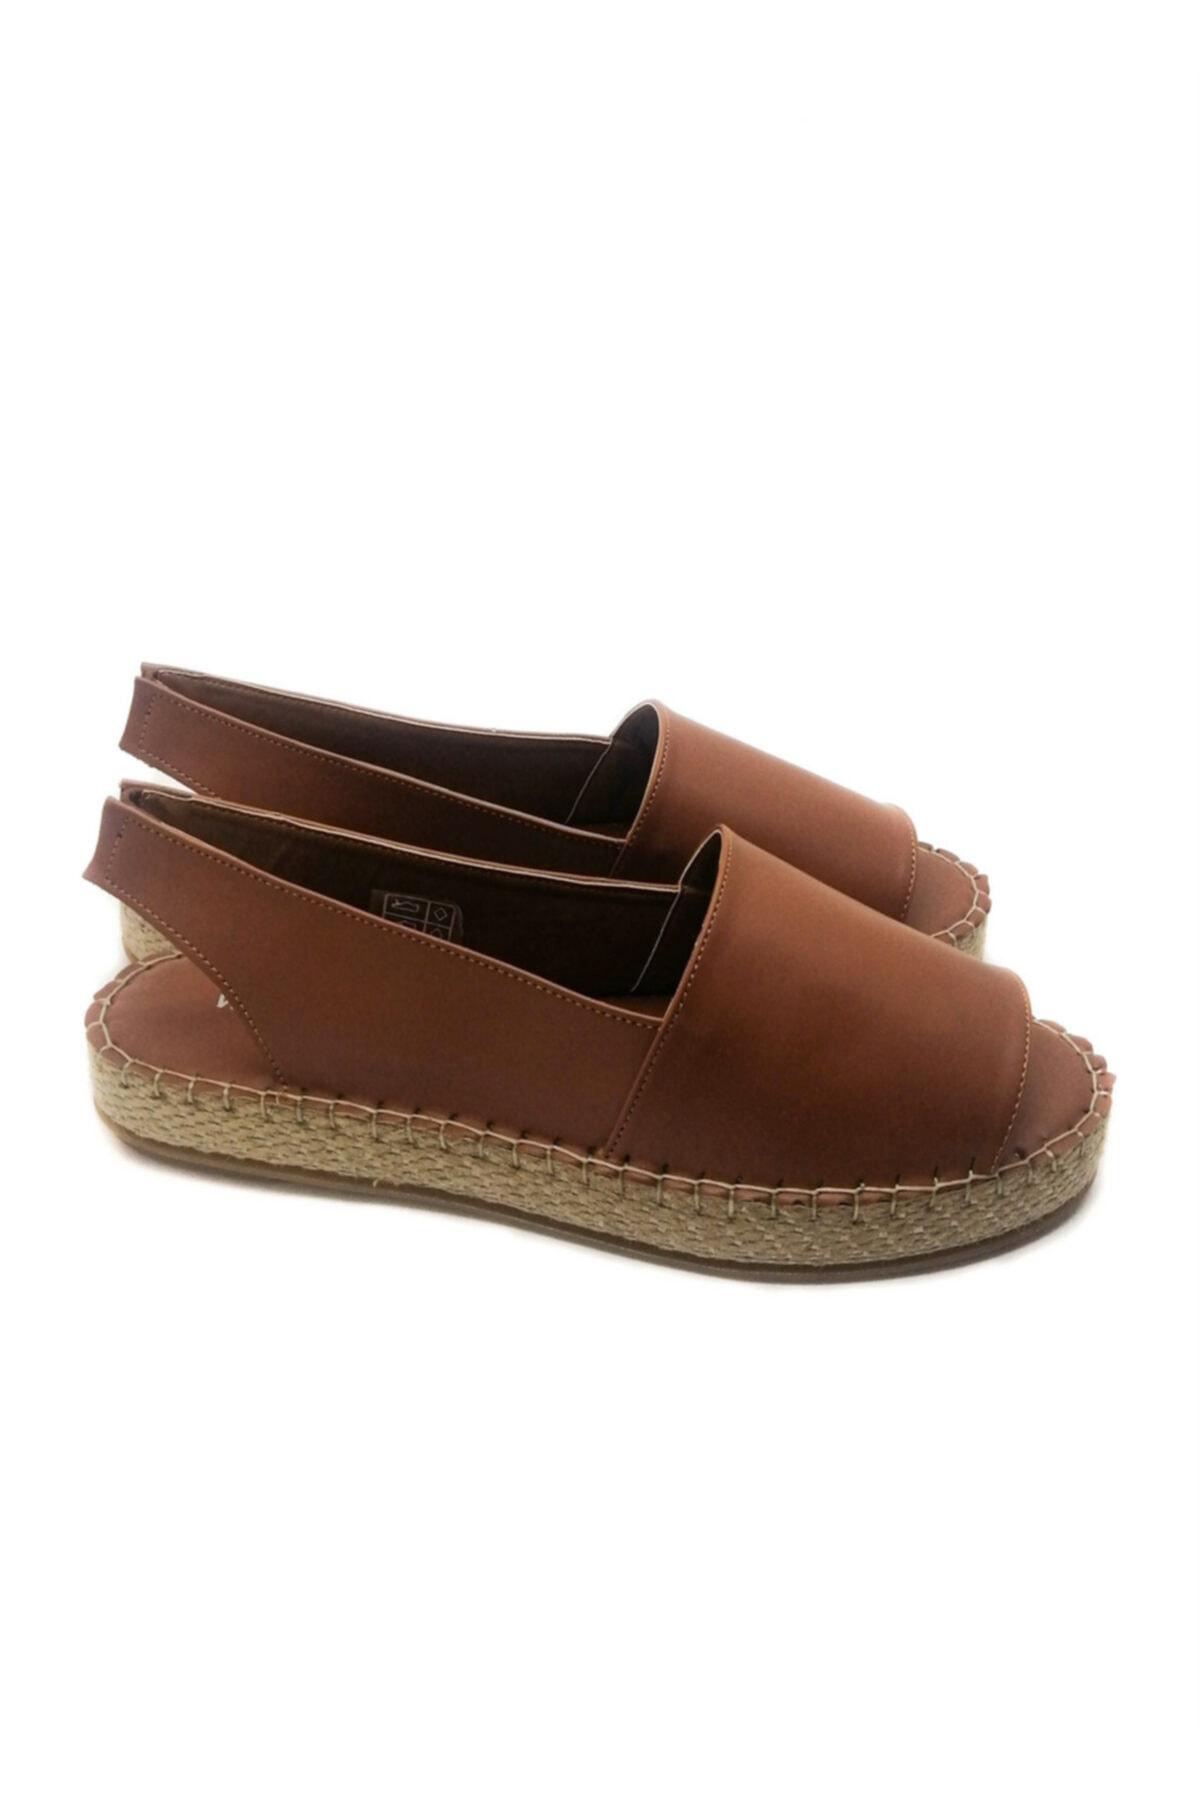 Kadın Kahverengi Cilt Sandalet